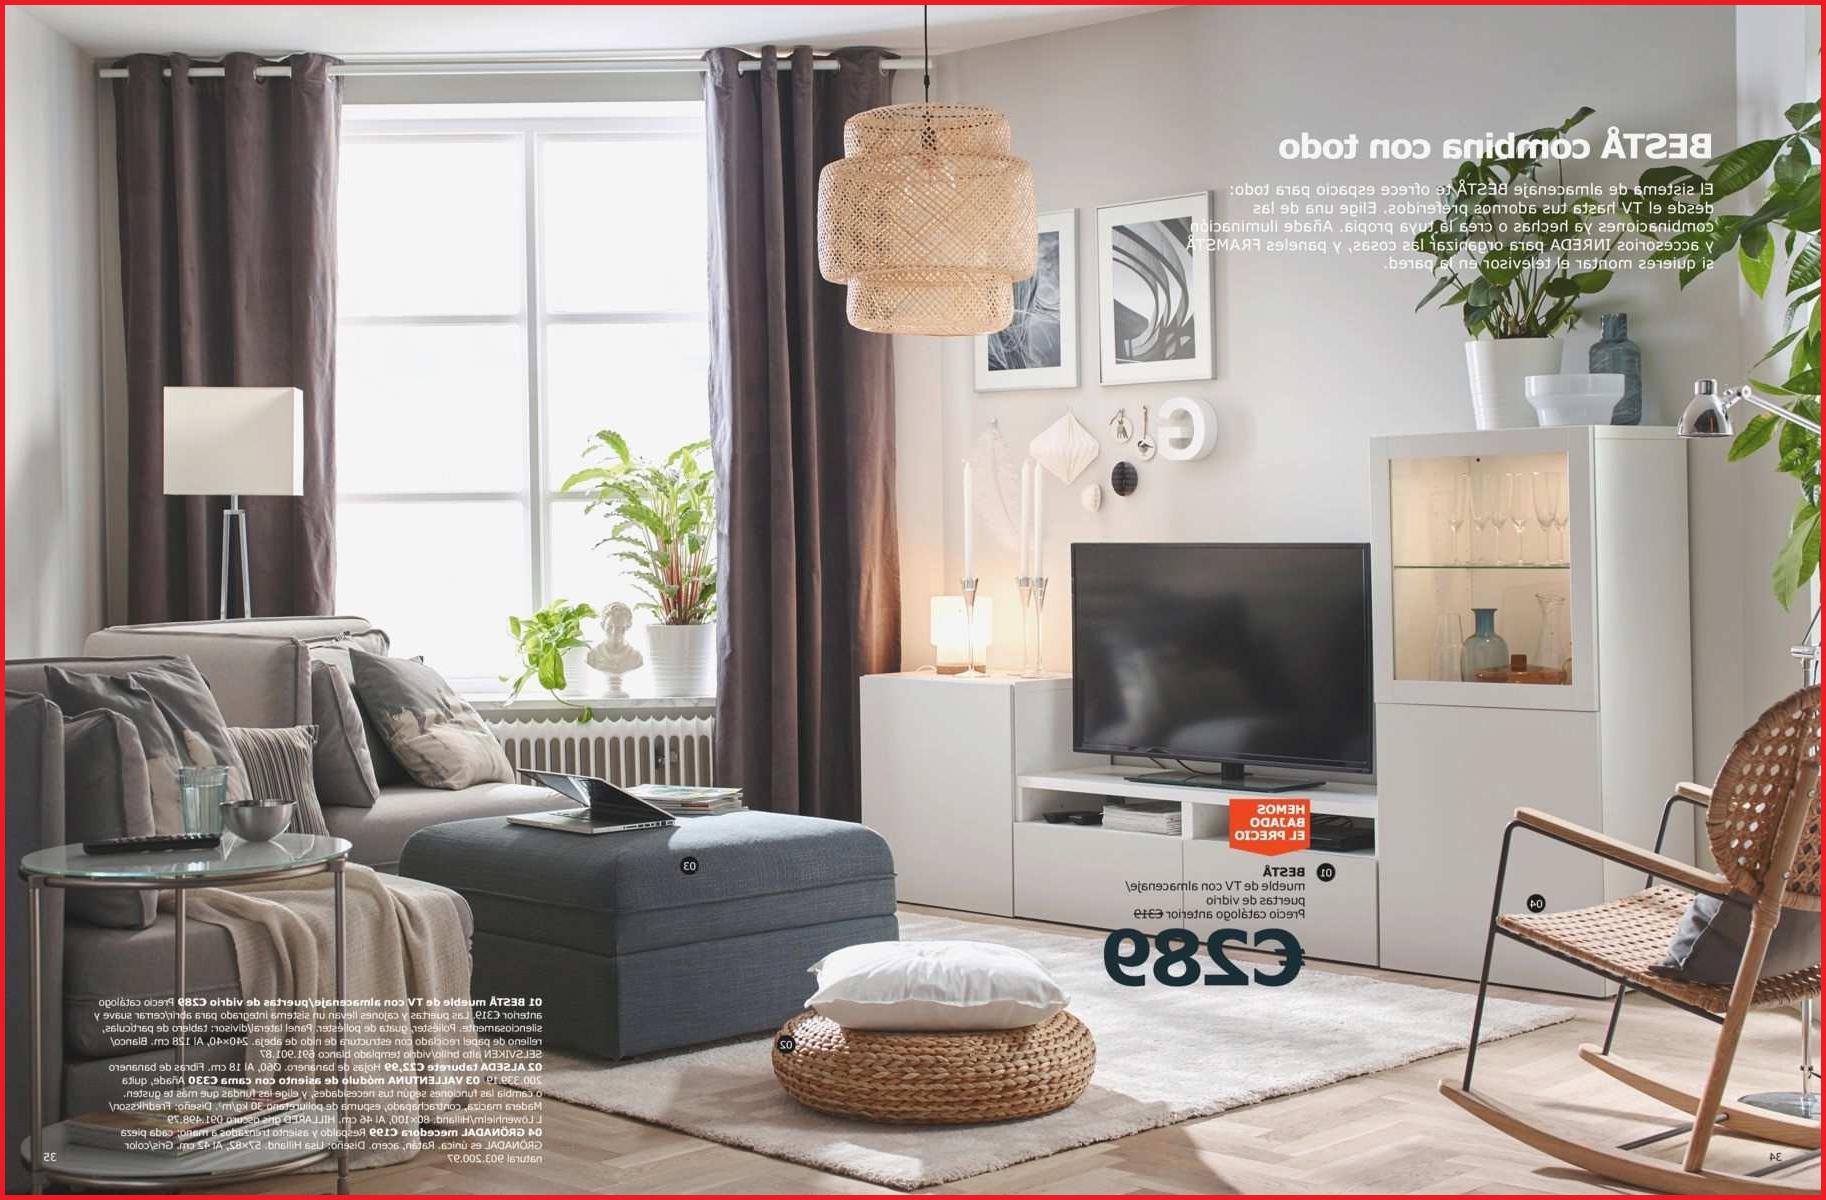 Ikea Muebles Salon Comedor Zwd9 Ikea Muebles Salon Edor Lo Mejor De ...